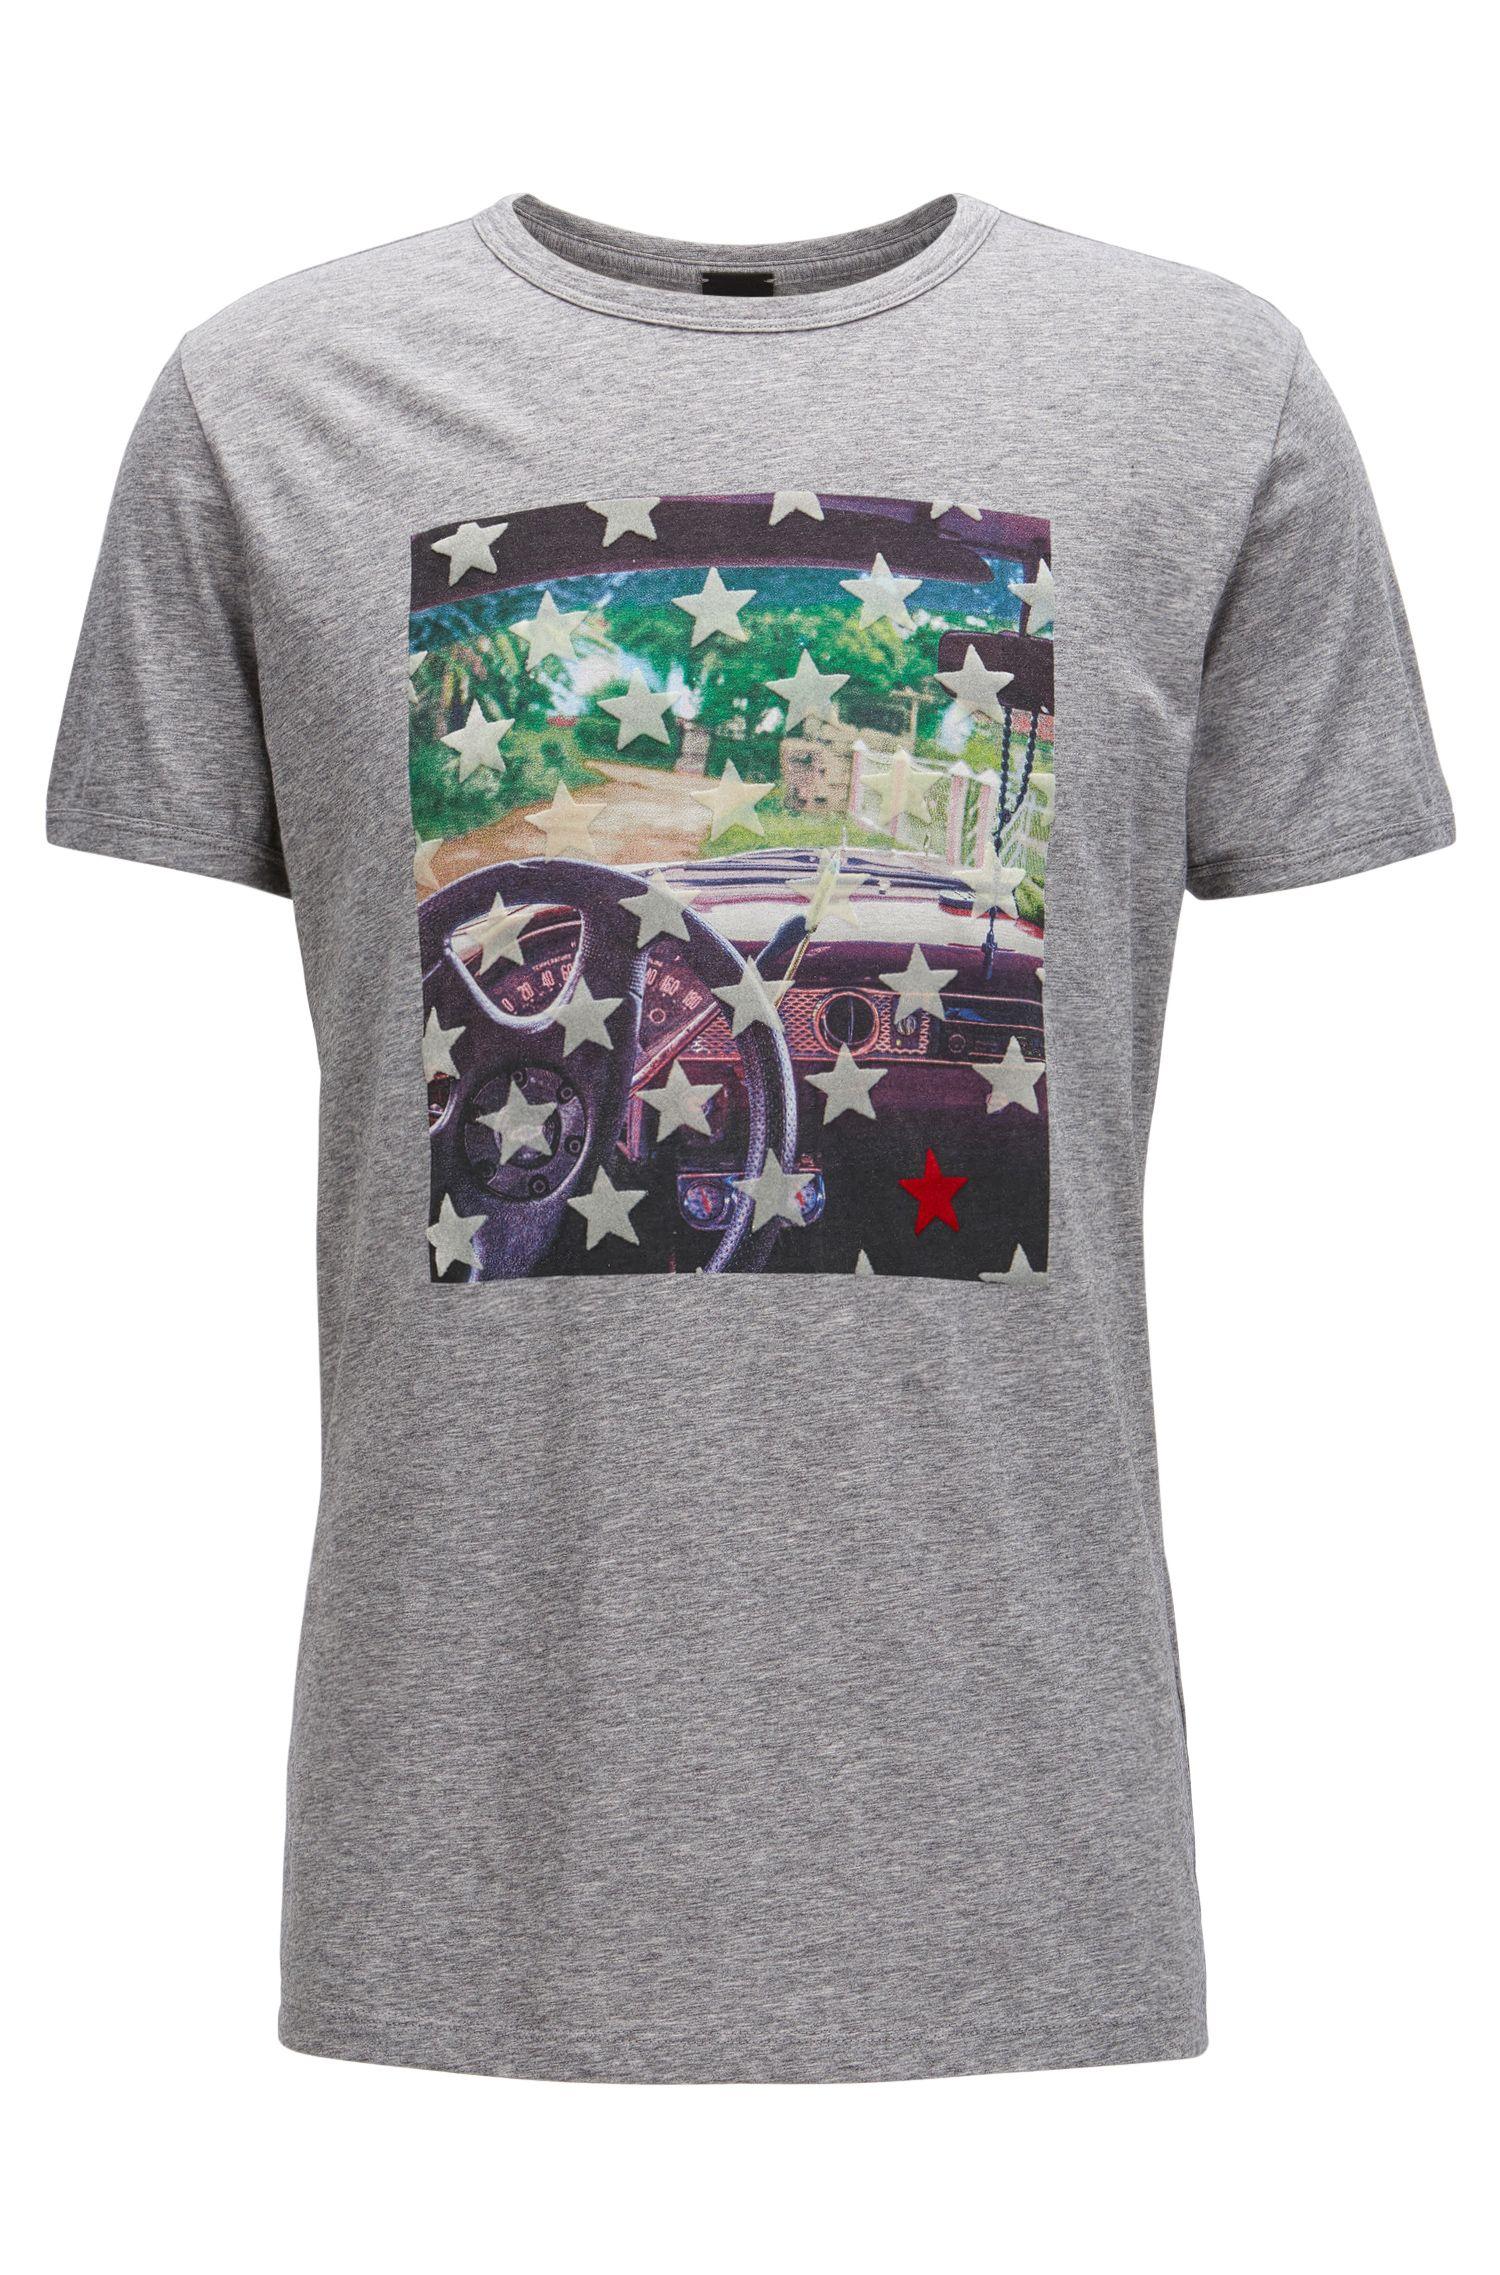 Cotton Graphic T-Shirt | Turbulent